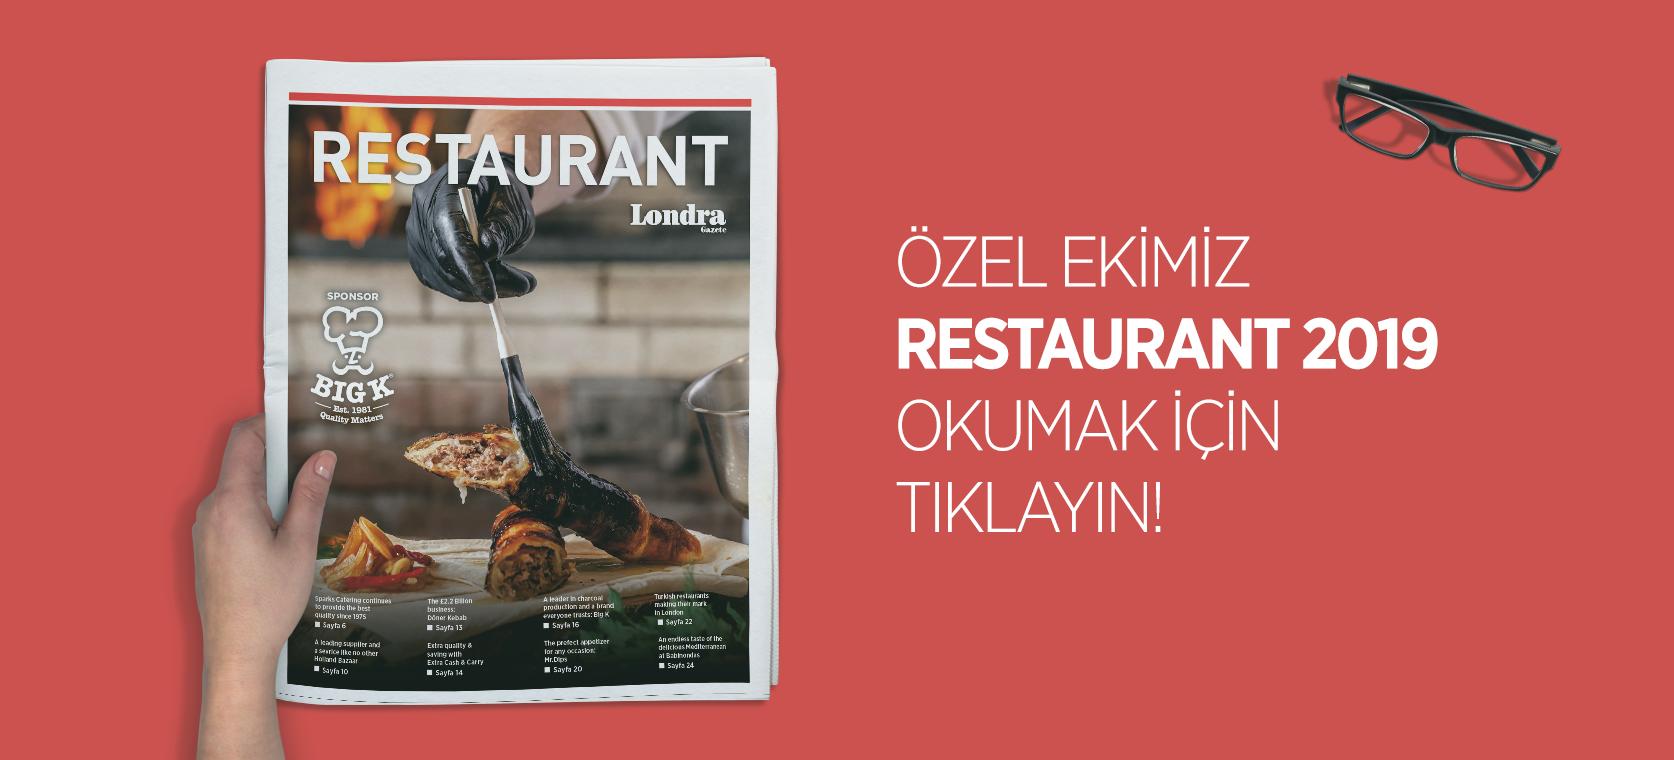 Restaurant 2019